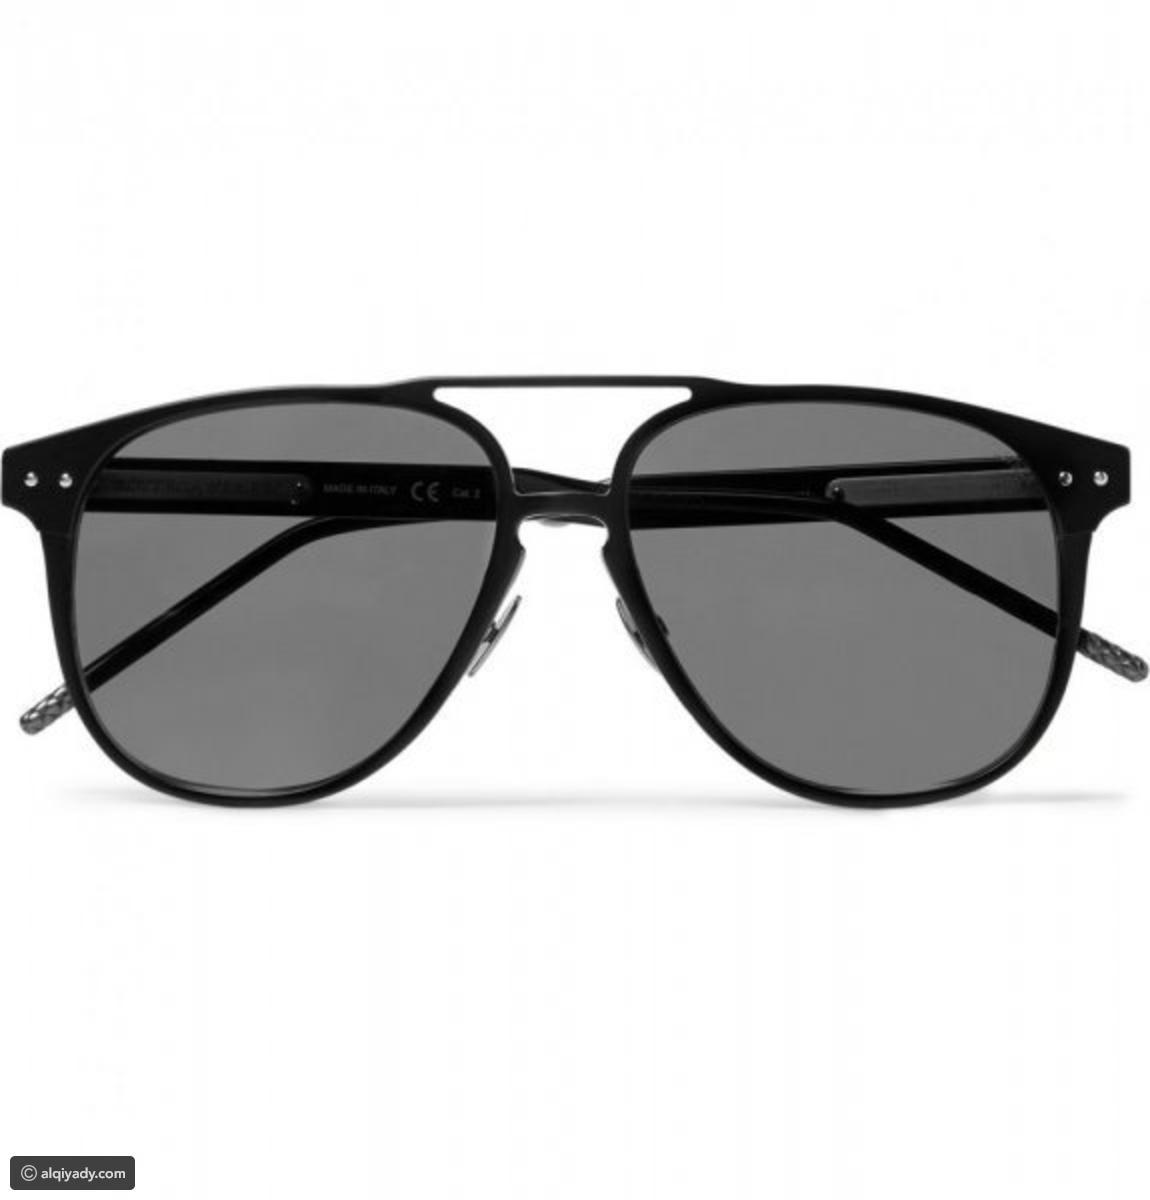 76bed9a4a لإطلالة أنيقة.. إليك تشكيلة نظارات عصرية لموسم 2019 (صور) | مجلة الرجل